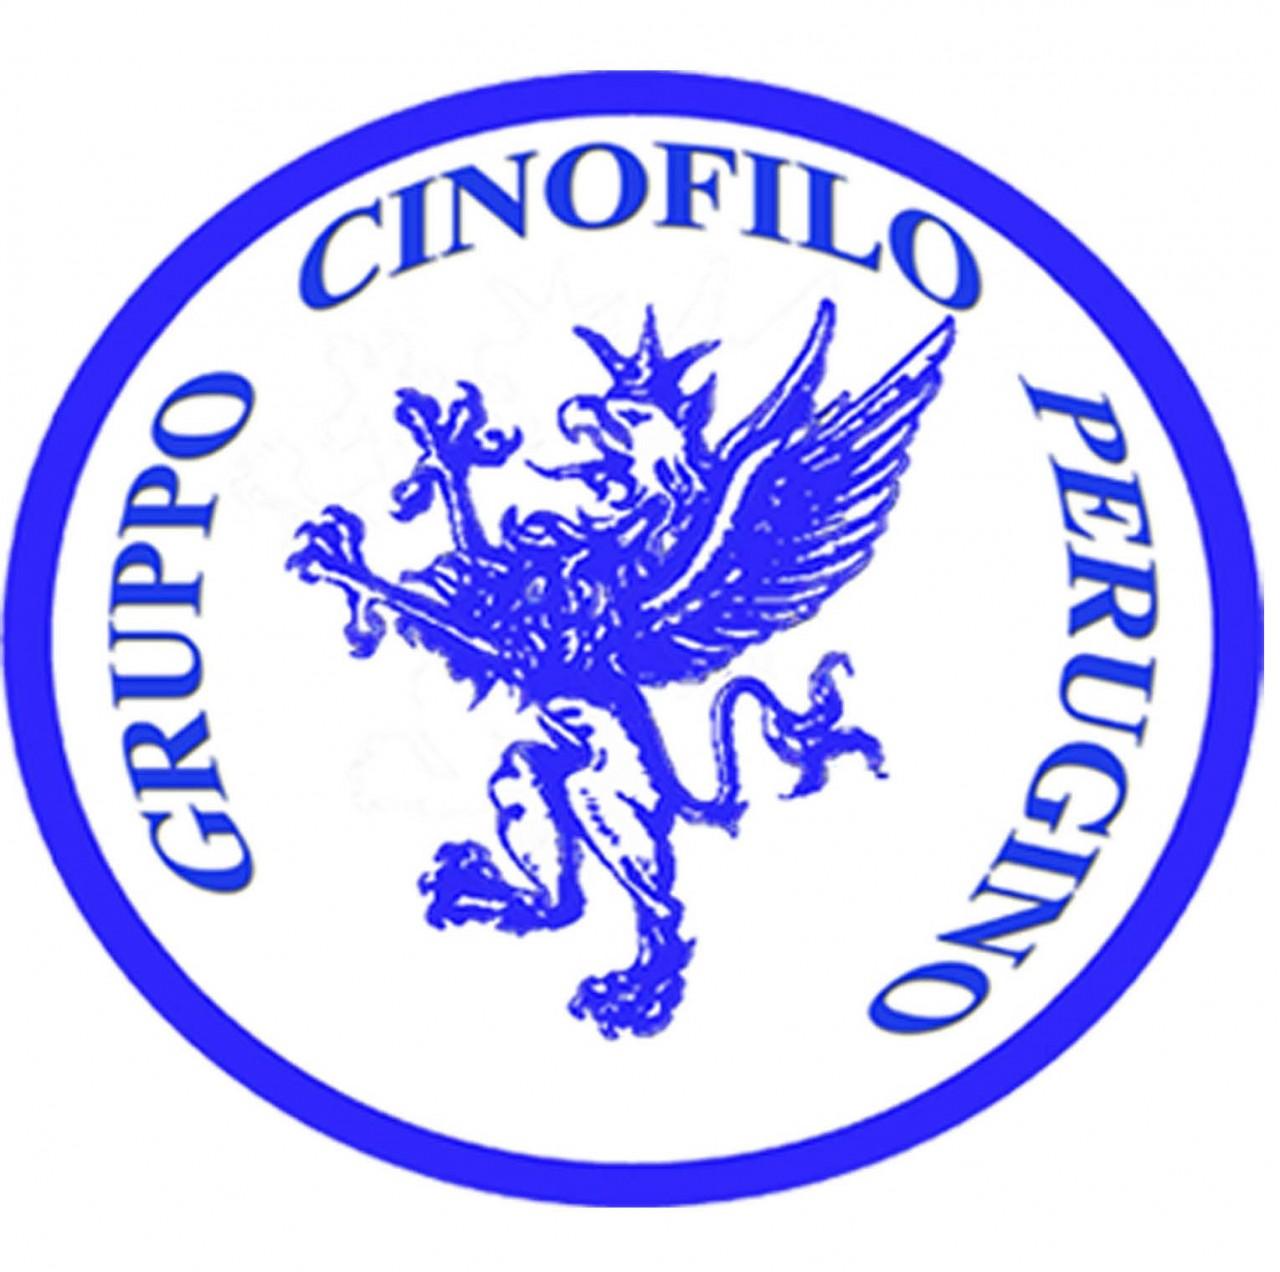 Gruppo Cinofilo Perugino